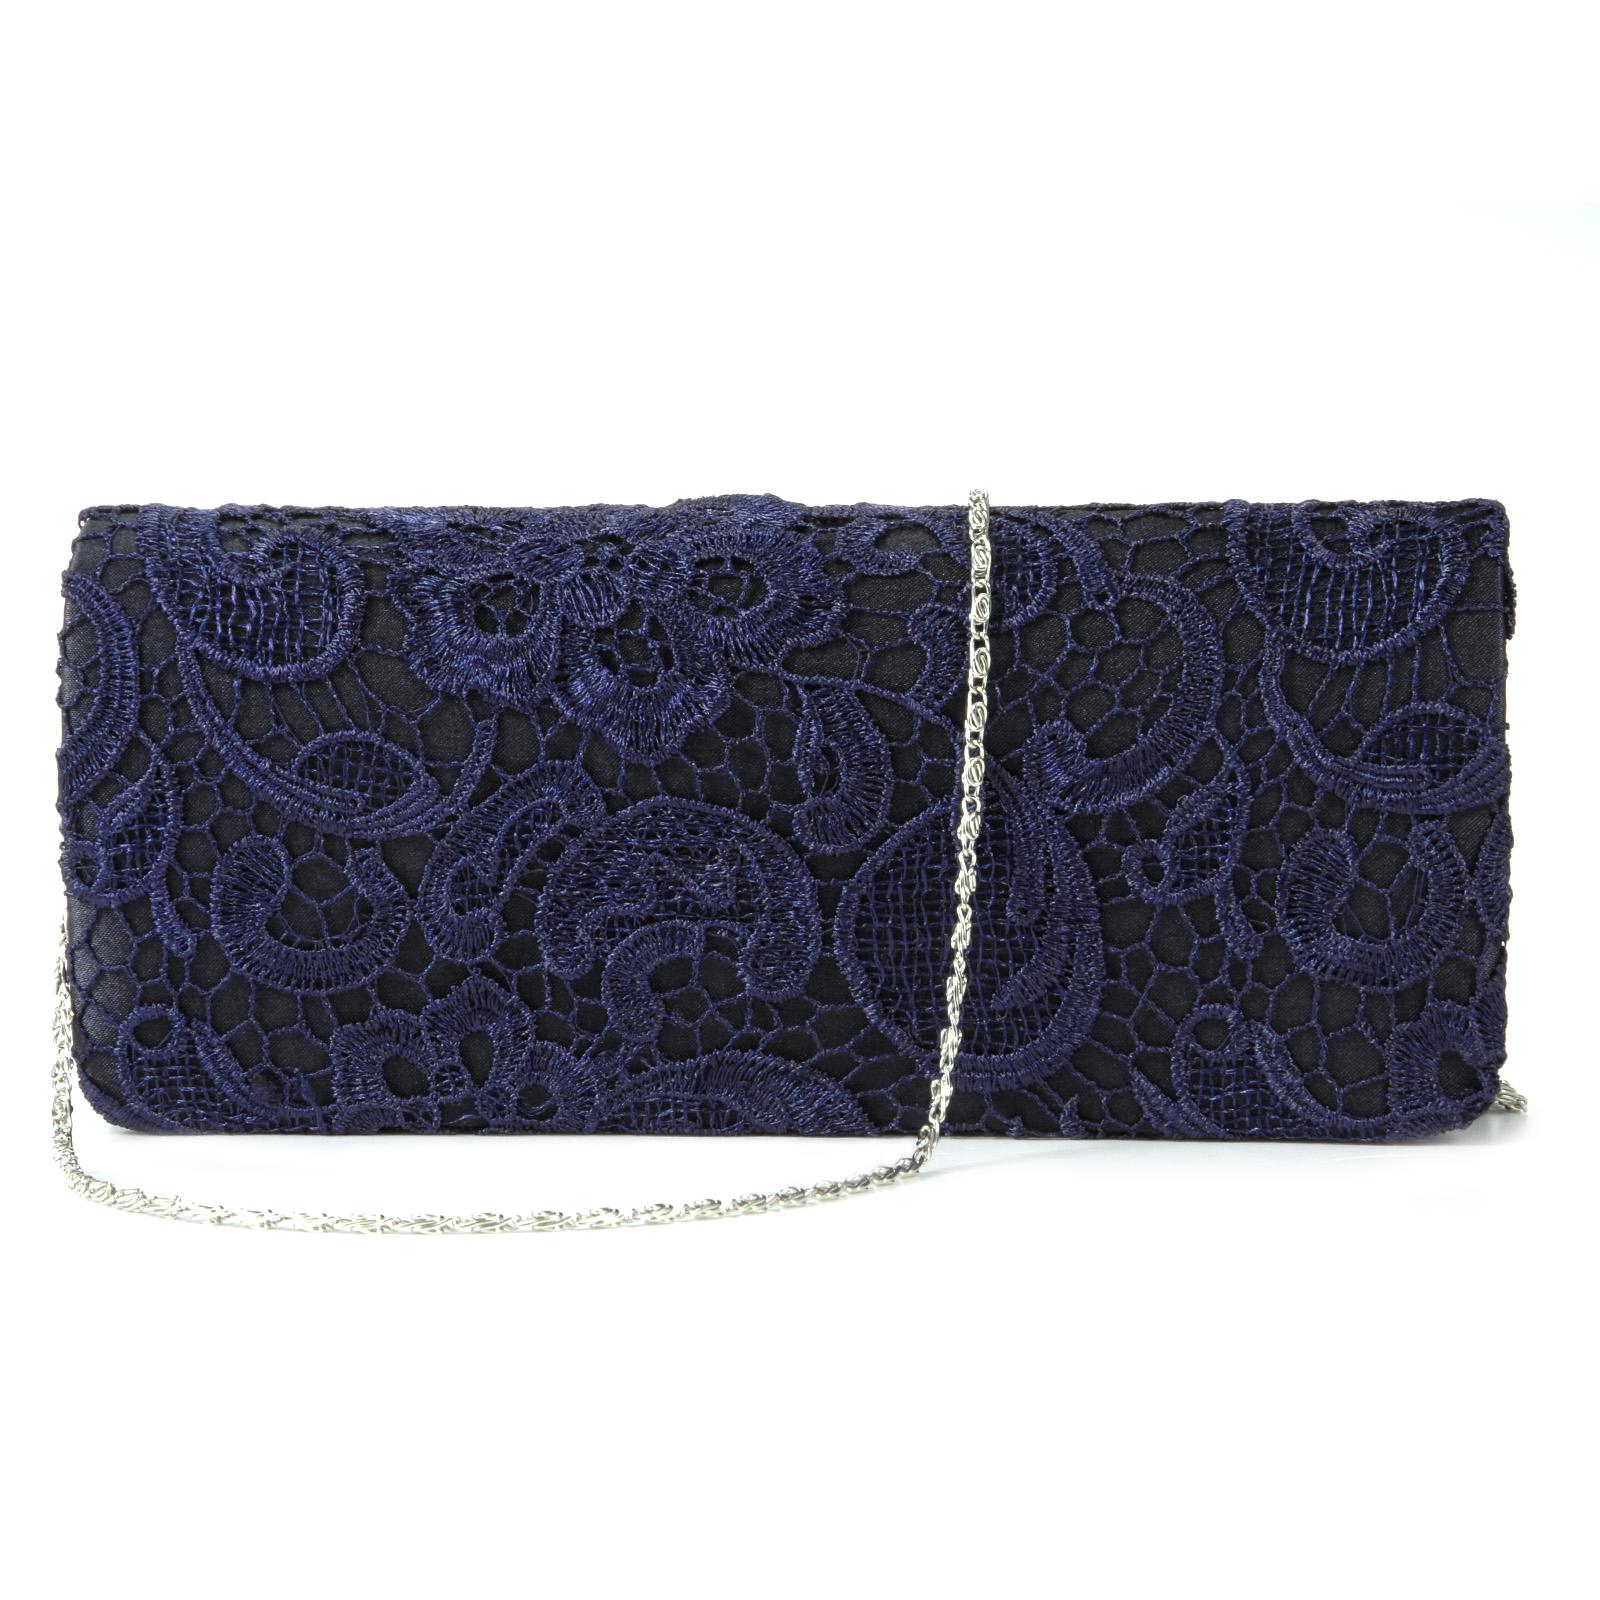 Navy Blue Floral Flower Satin Lace Evening Party Clutch Bag Bridal Purse Handbag | EBay